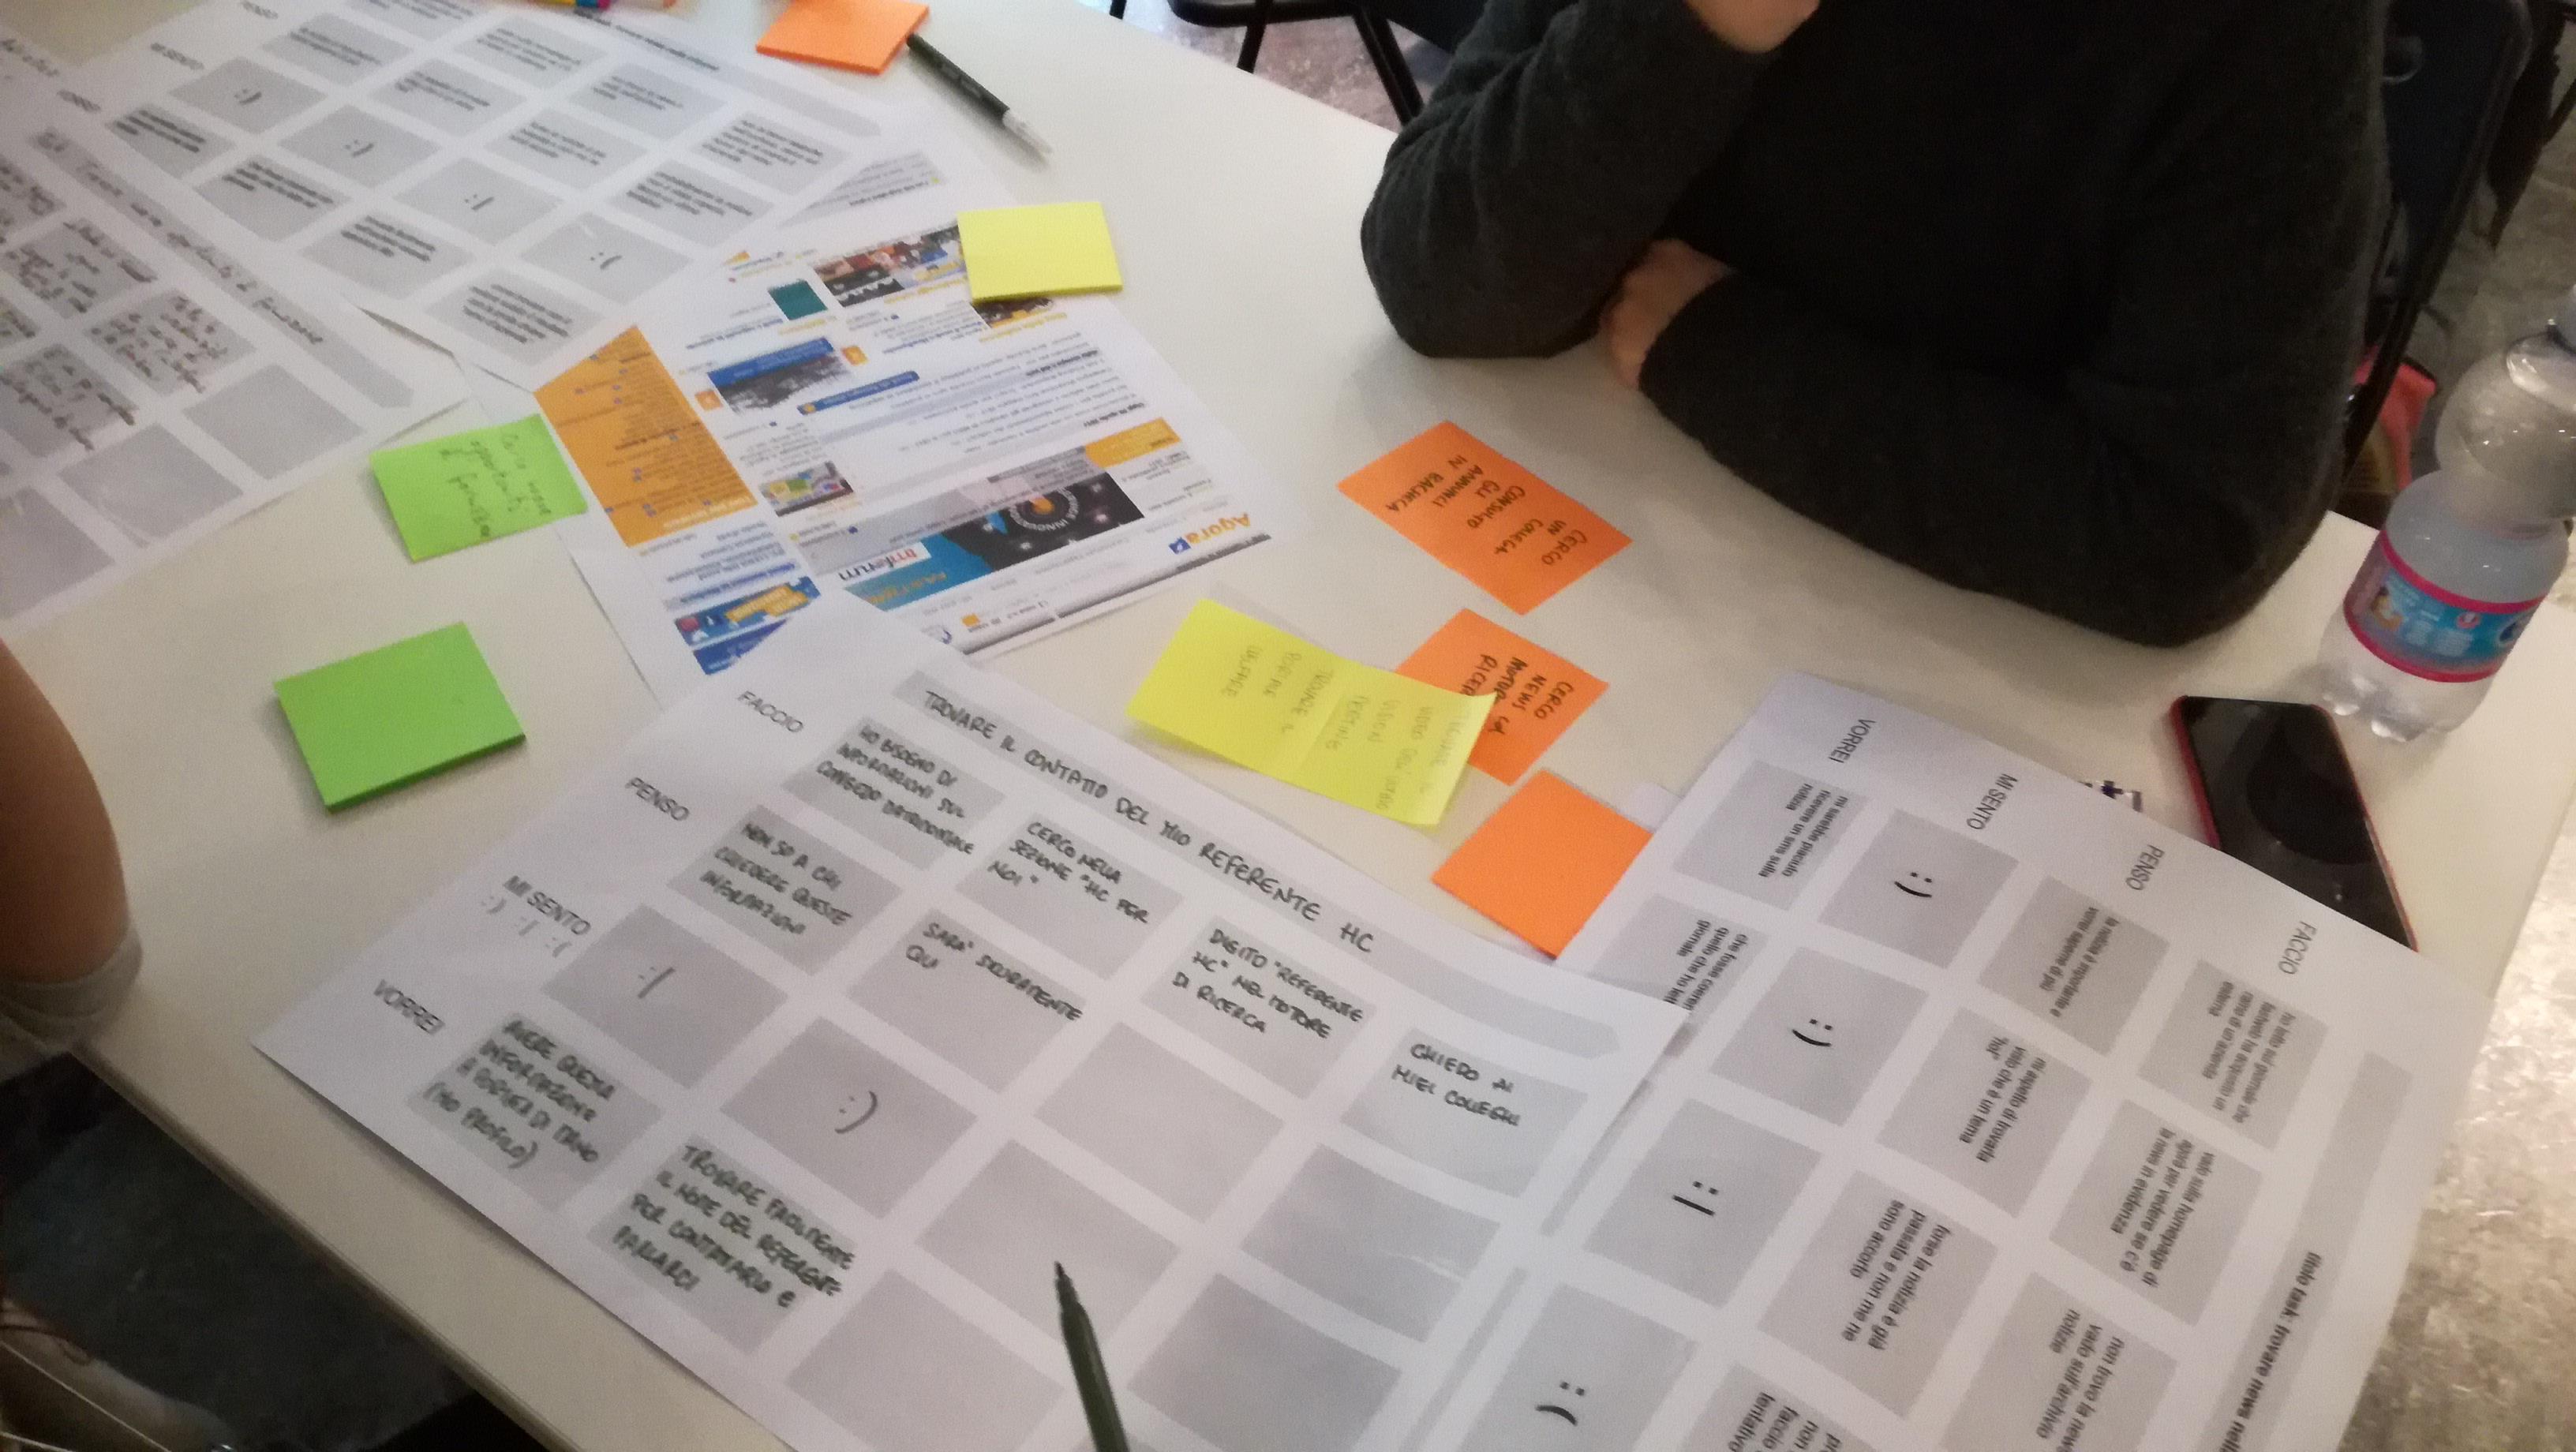 fastweb_co_design_01_[intranet_management]